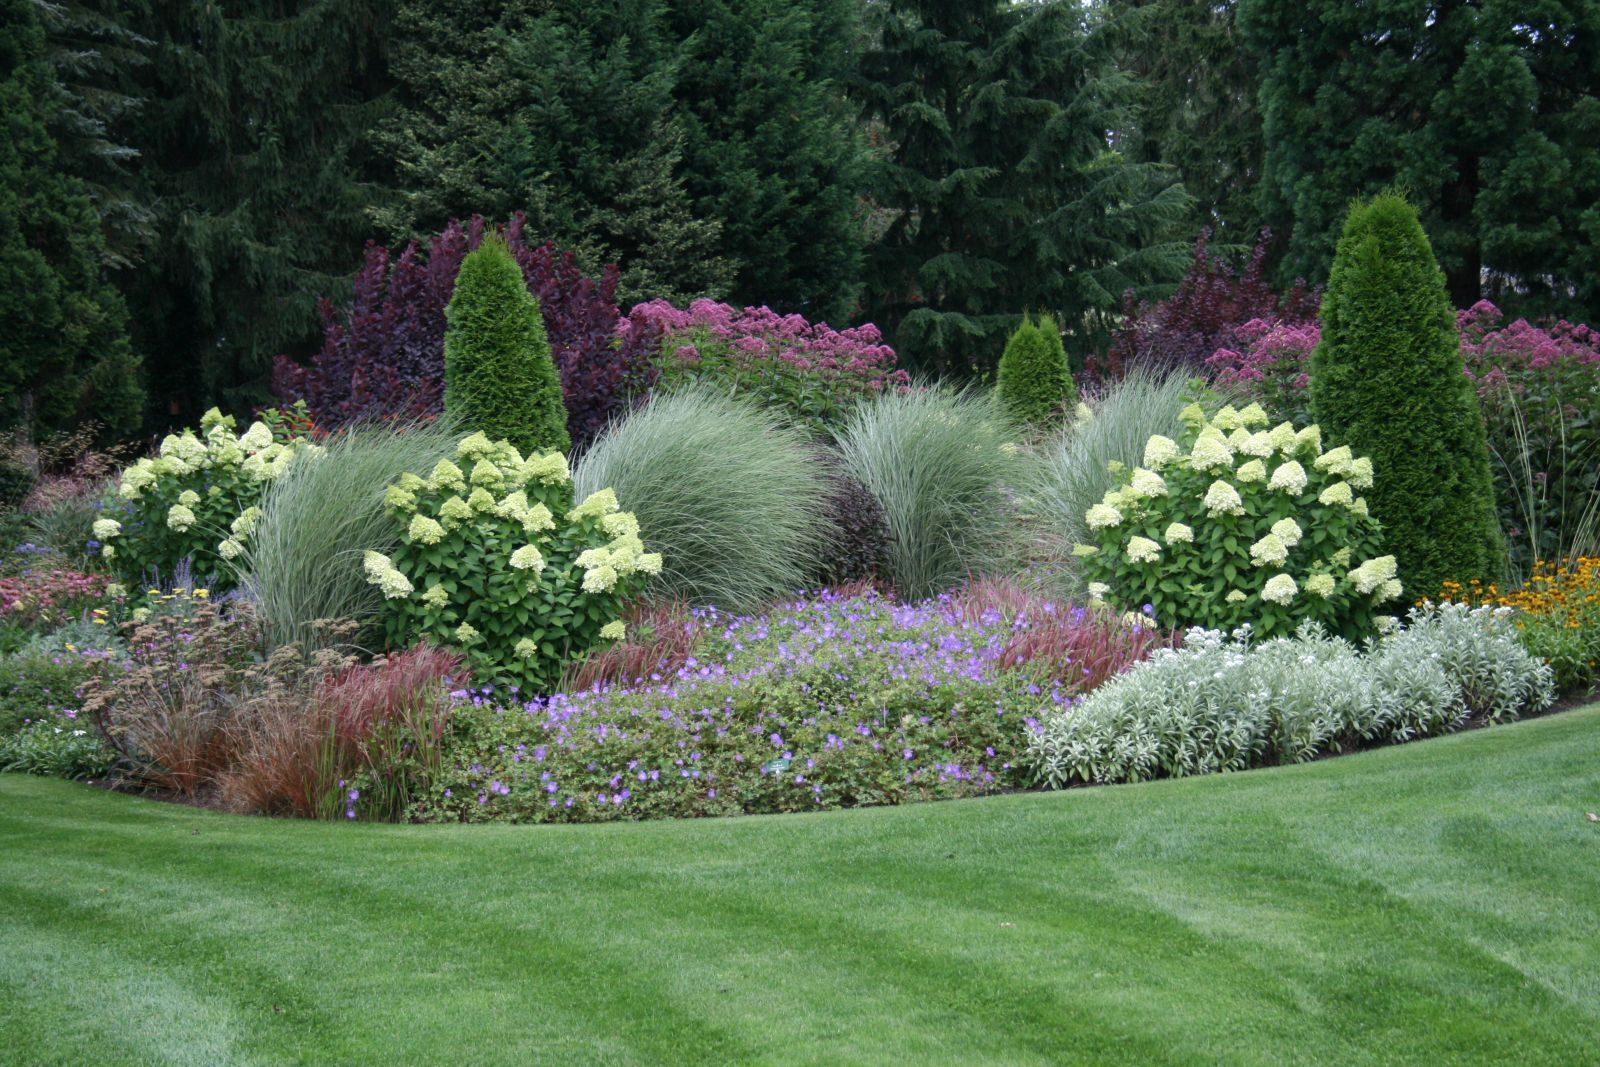 Gräsergarten Bilder img 0102 jpg 1600 1067 plantes et fleurs gardens